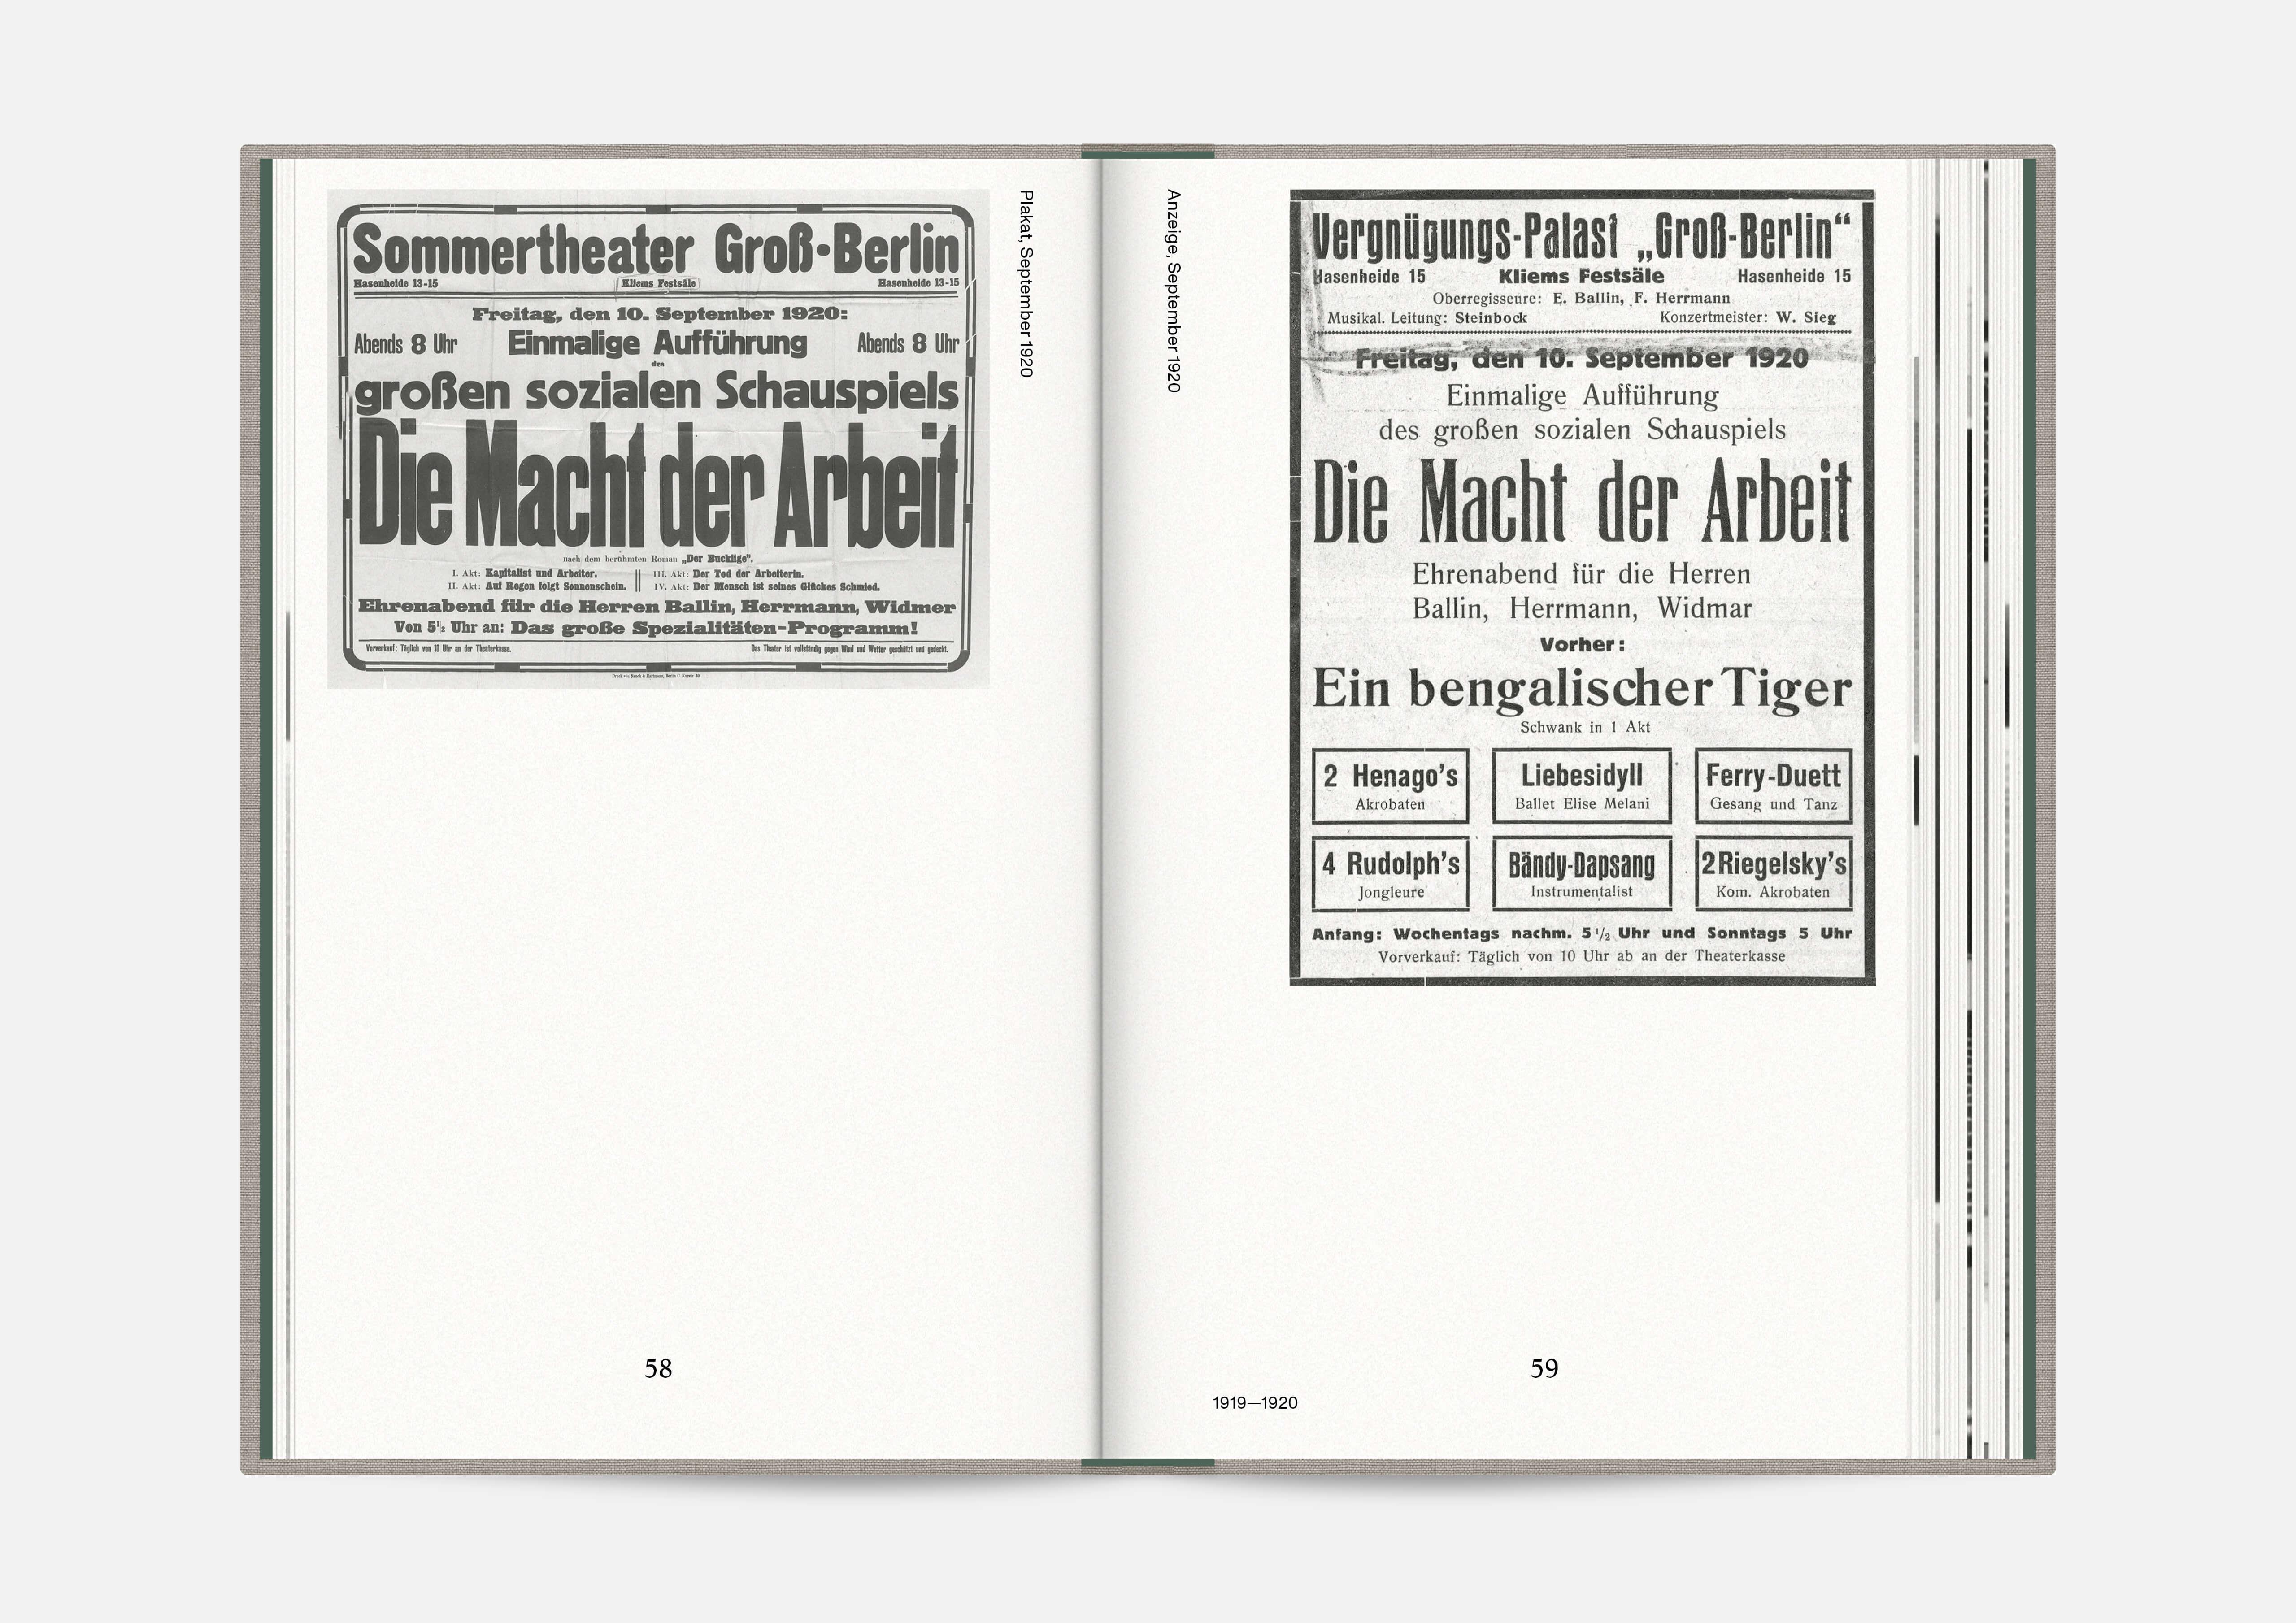 https://neuegestaltung.de/media/pages/clients/sammlung-wemhoner-hasenheide-13/d2f9090fef-1628761381/sw-hasenheide_15.jpg